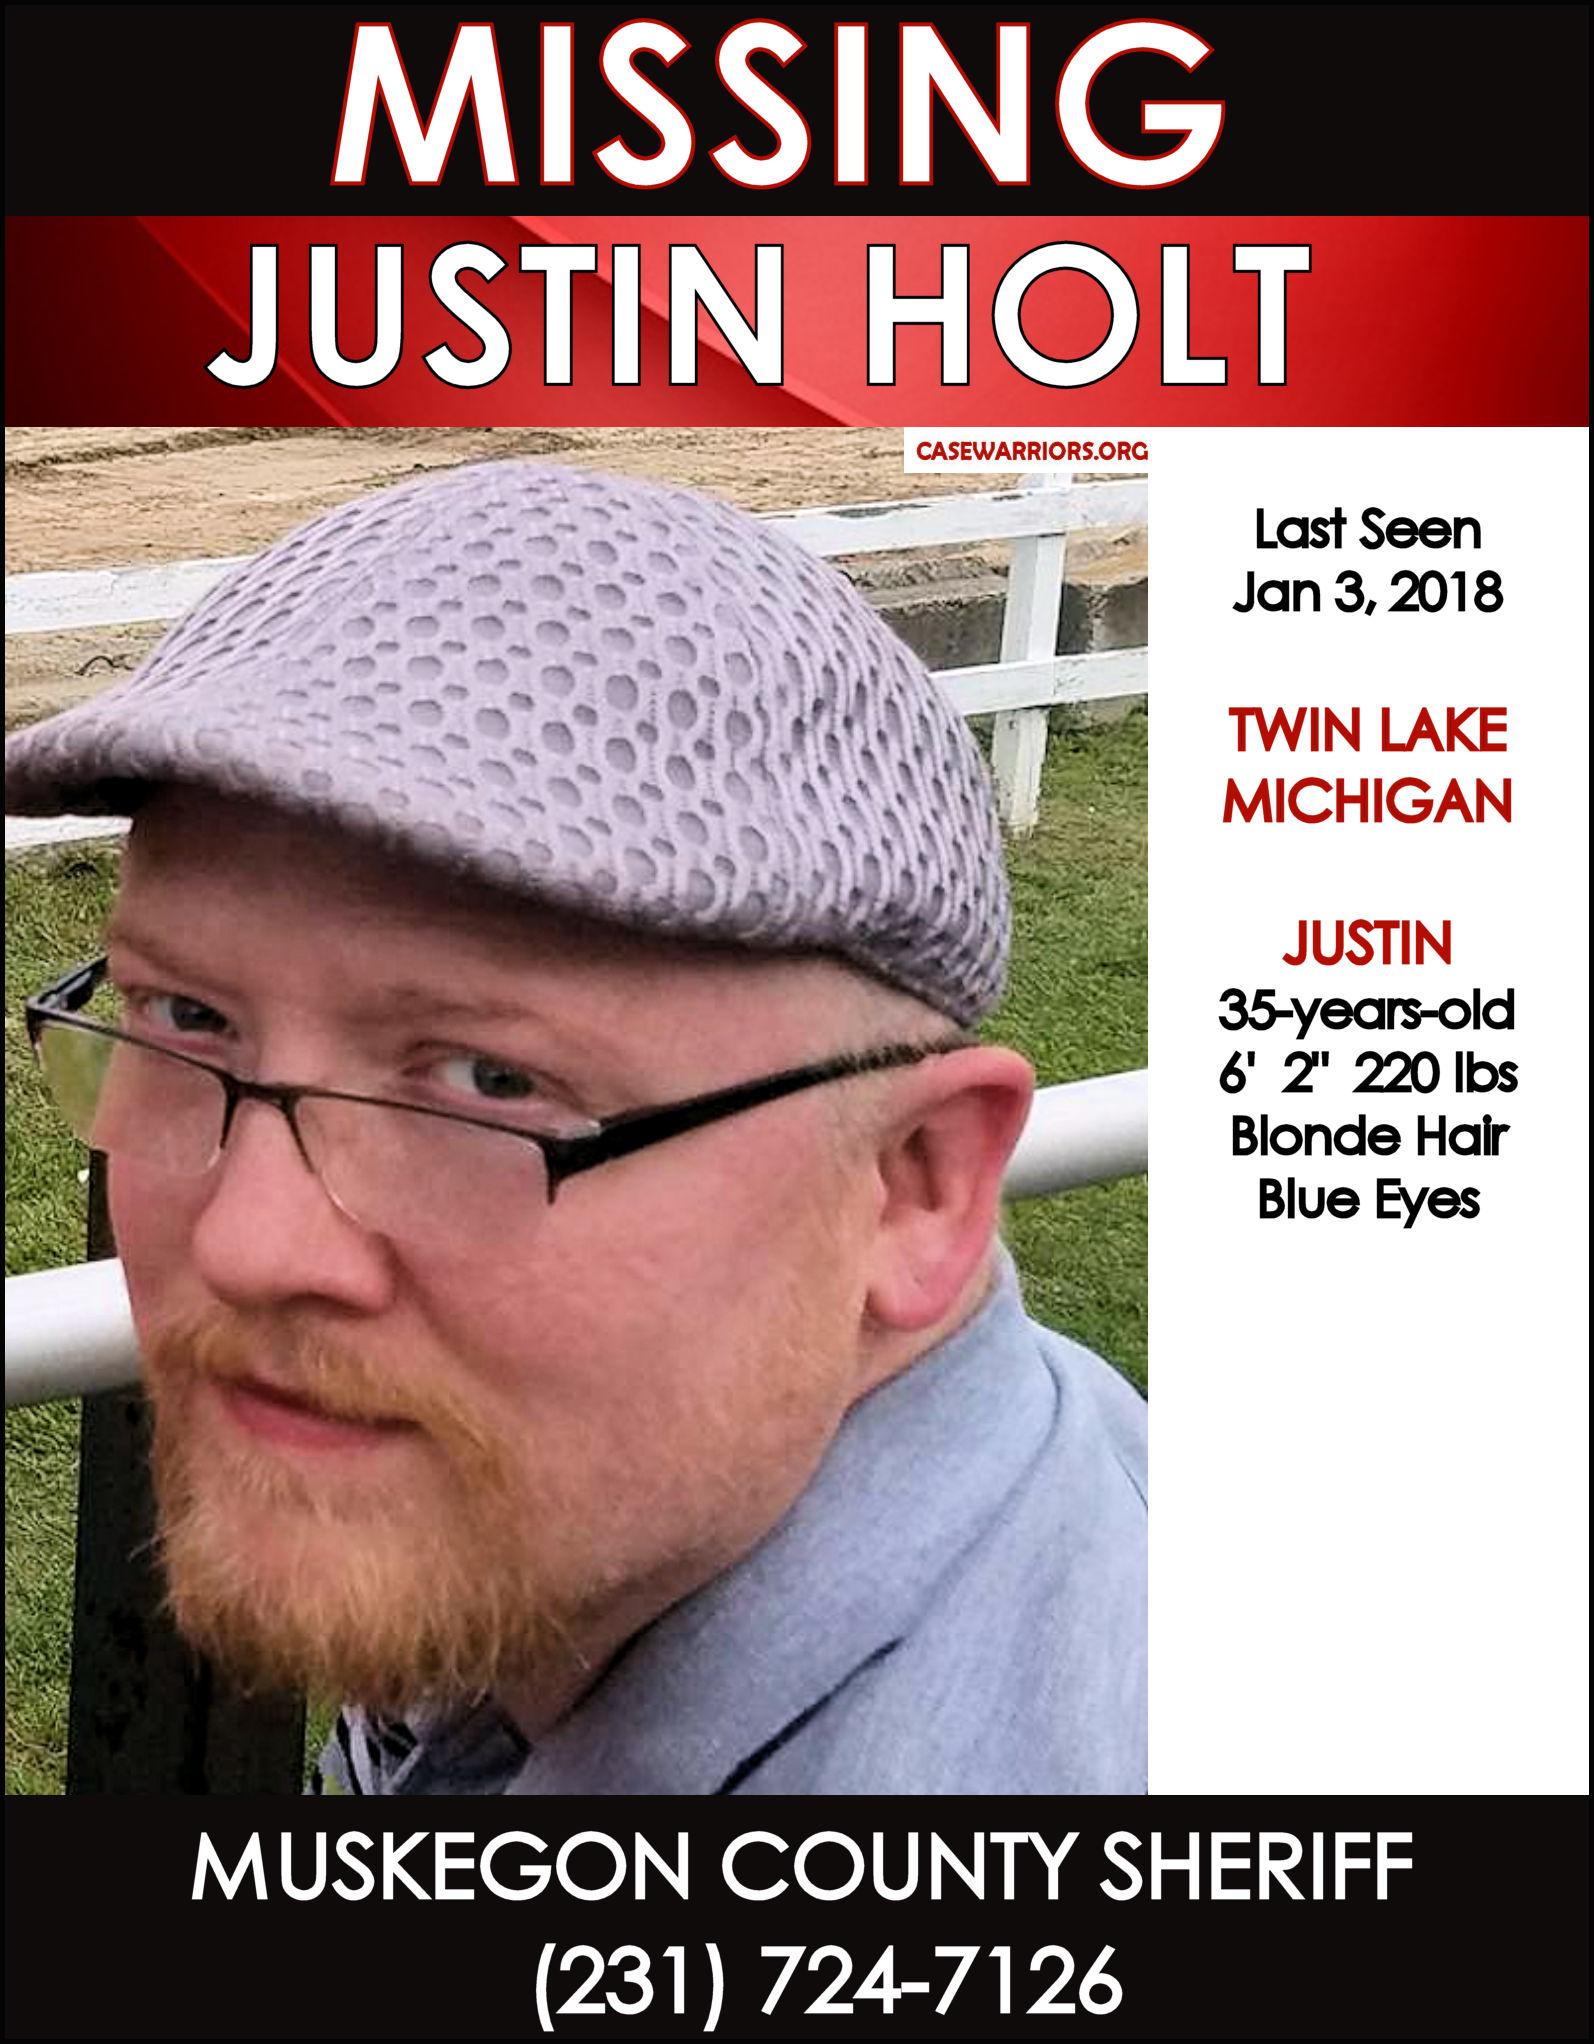 JUSTIN HOLT